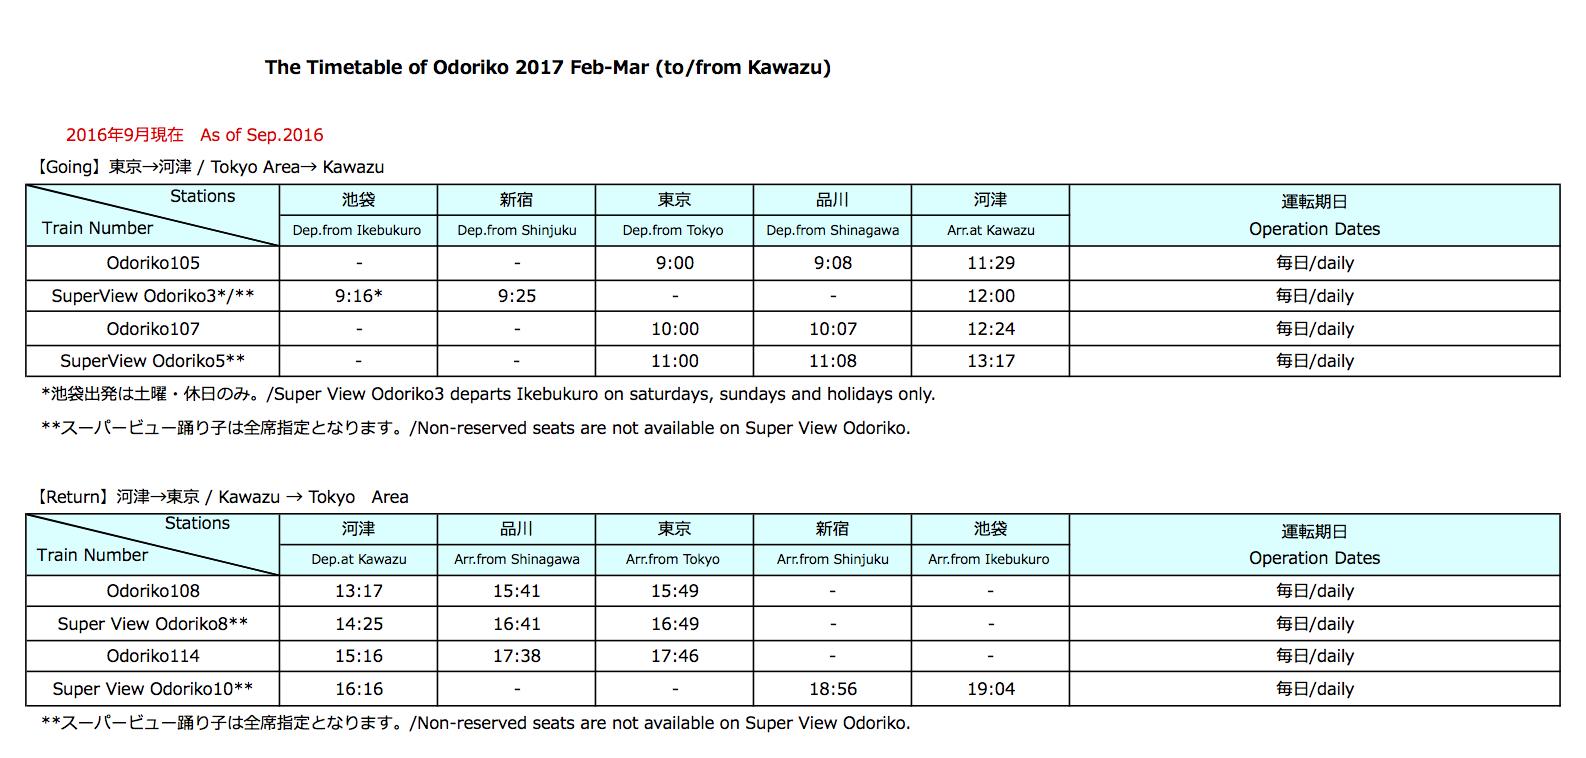 KANTO BUFFET ONEDAY Kawazu Cherry Blossoms Train time table